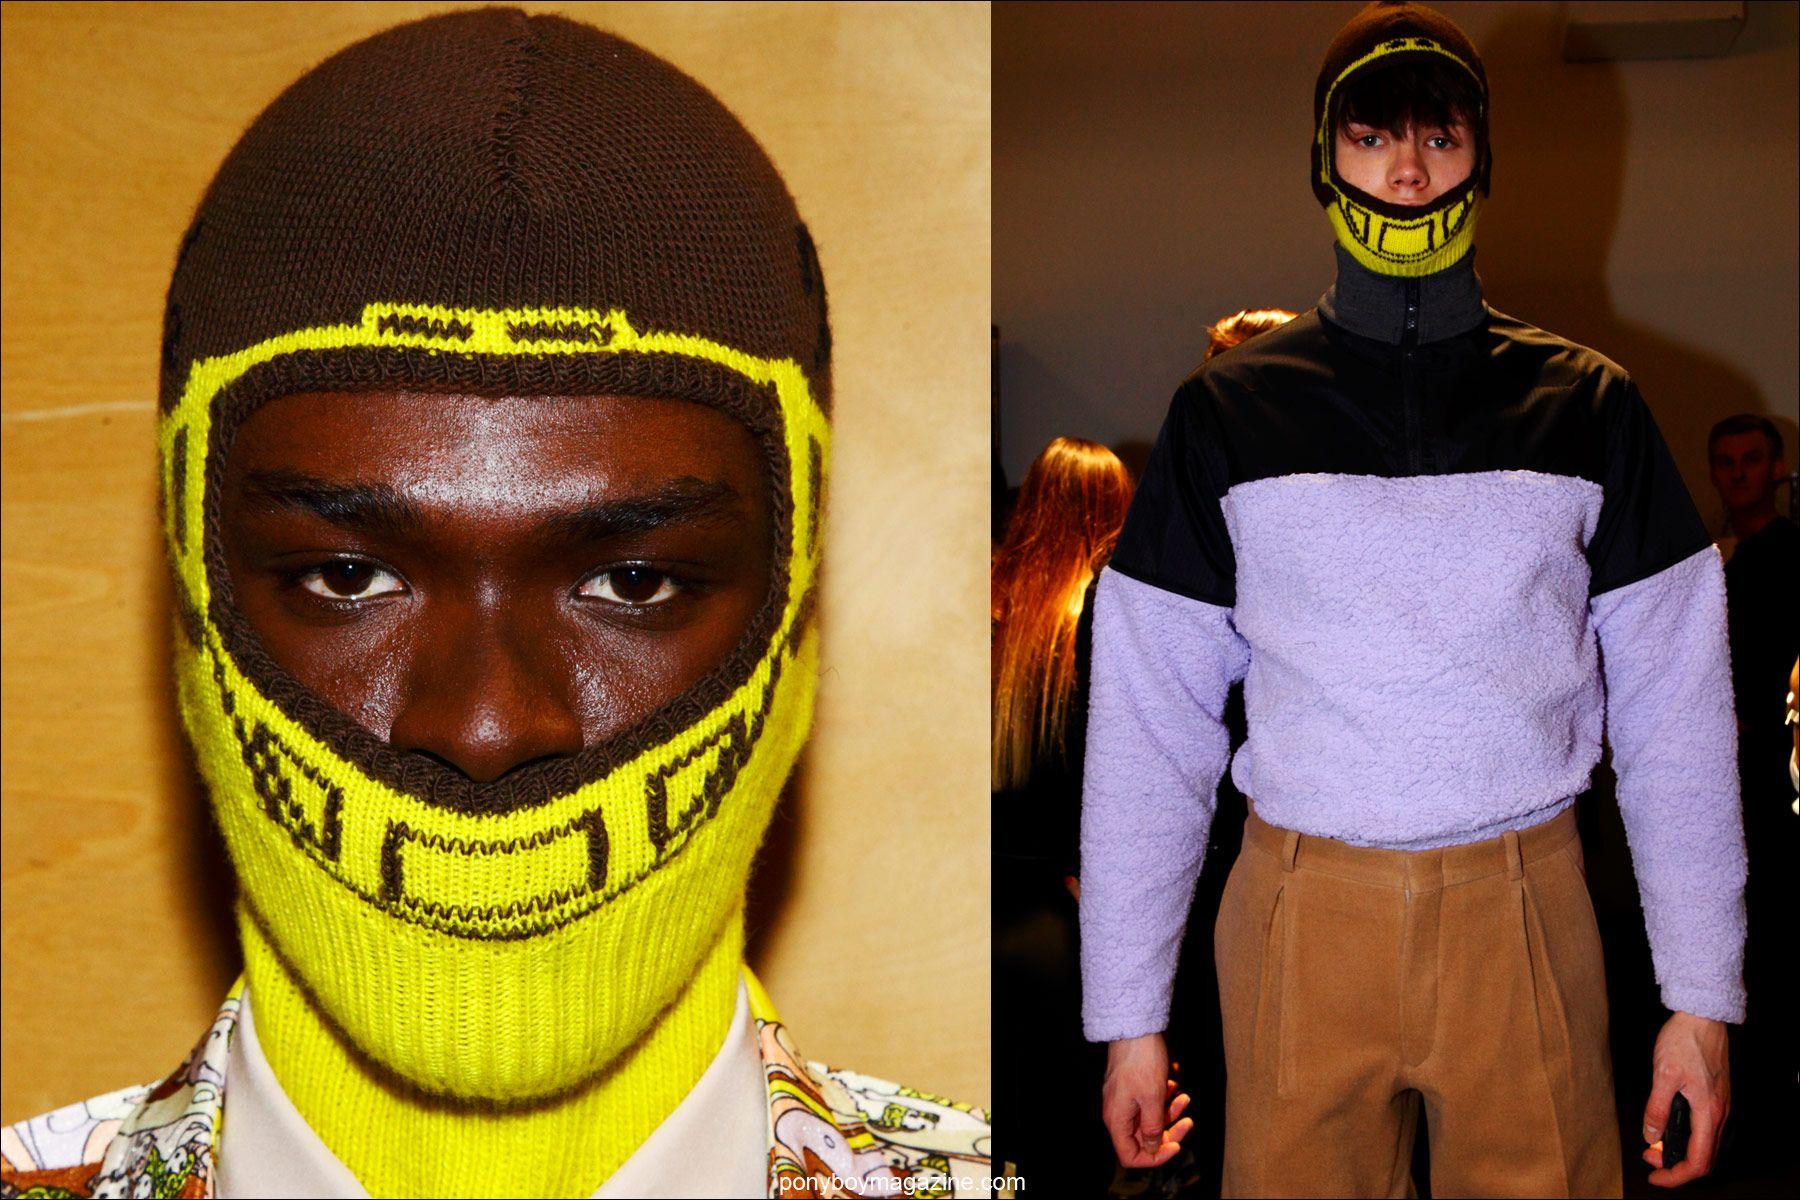 Ski masks by menswear designer Martin Keehn, F/W15 collection, at Pier 59 Studios New York. Photos by Ponyboy magazine photographer Alexander Thompson.